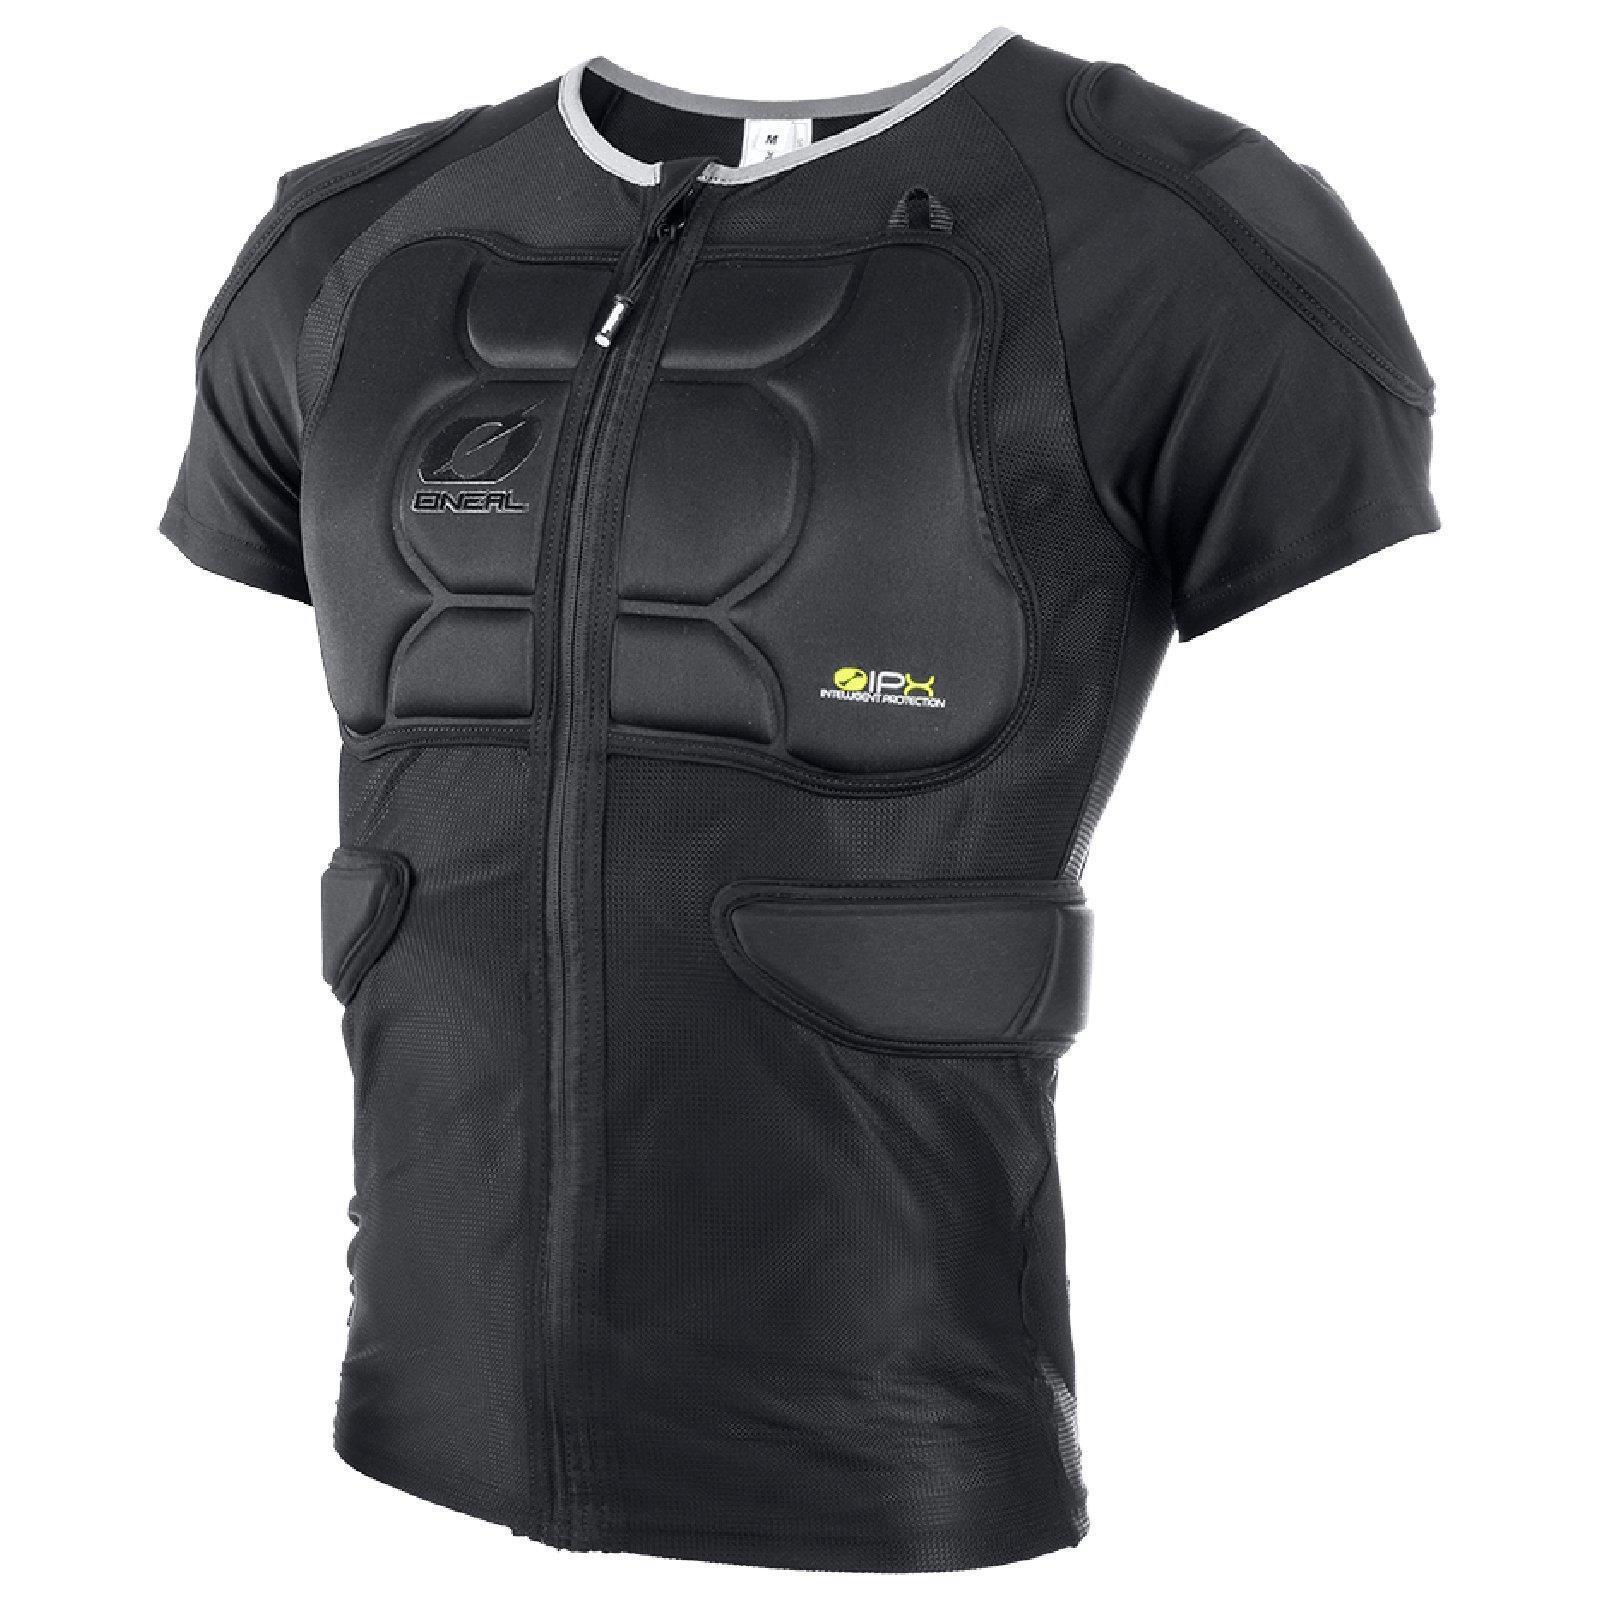 ONeal BP manga corta projoector chaqueta tanque projoección descenso MTB DH FR Moto cross MX